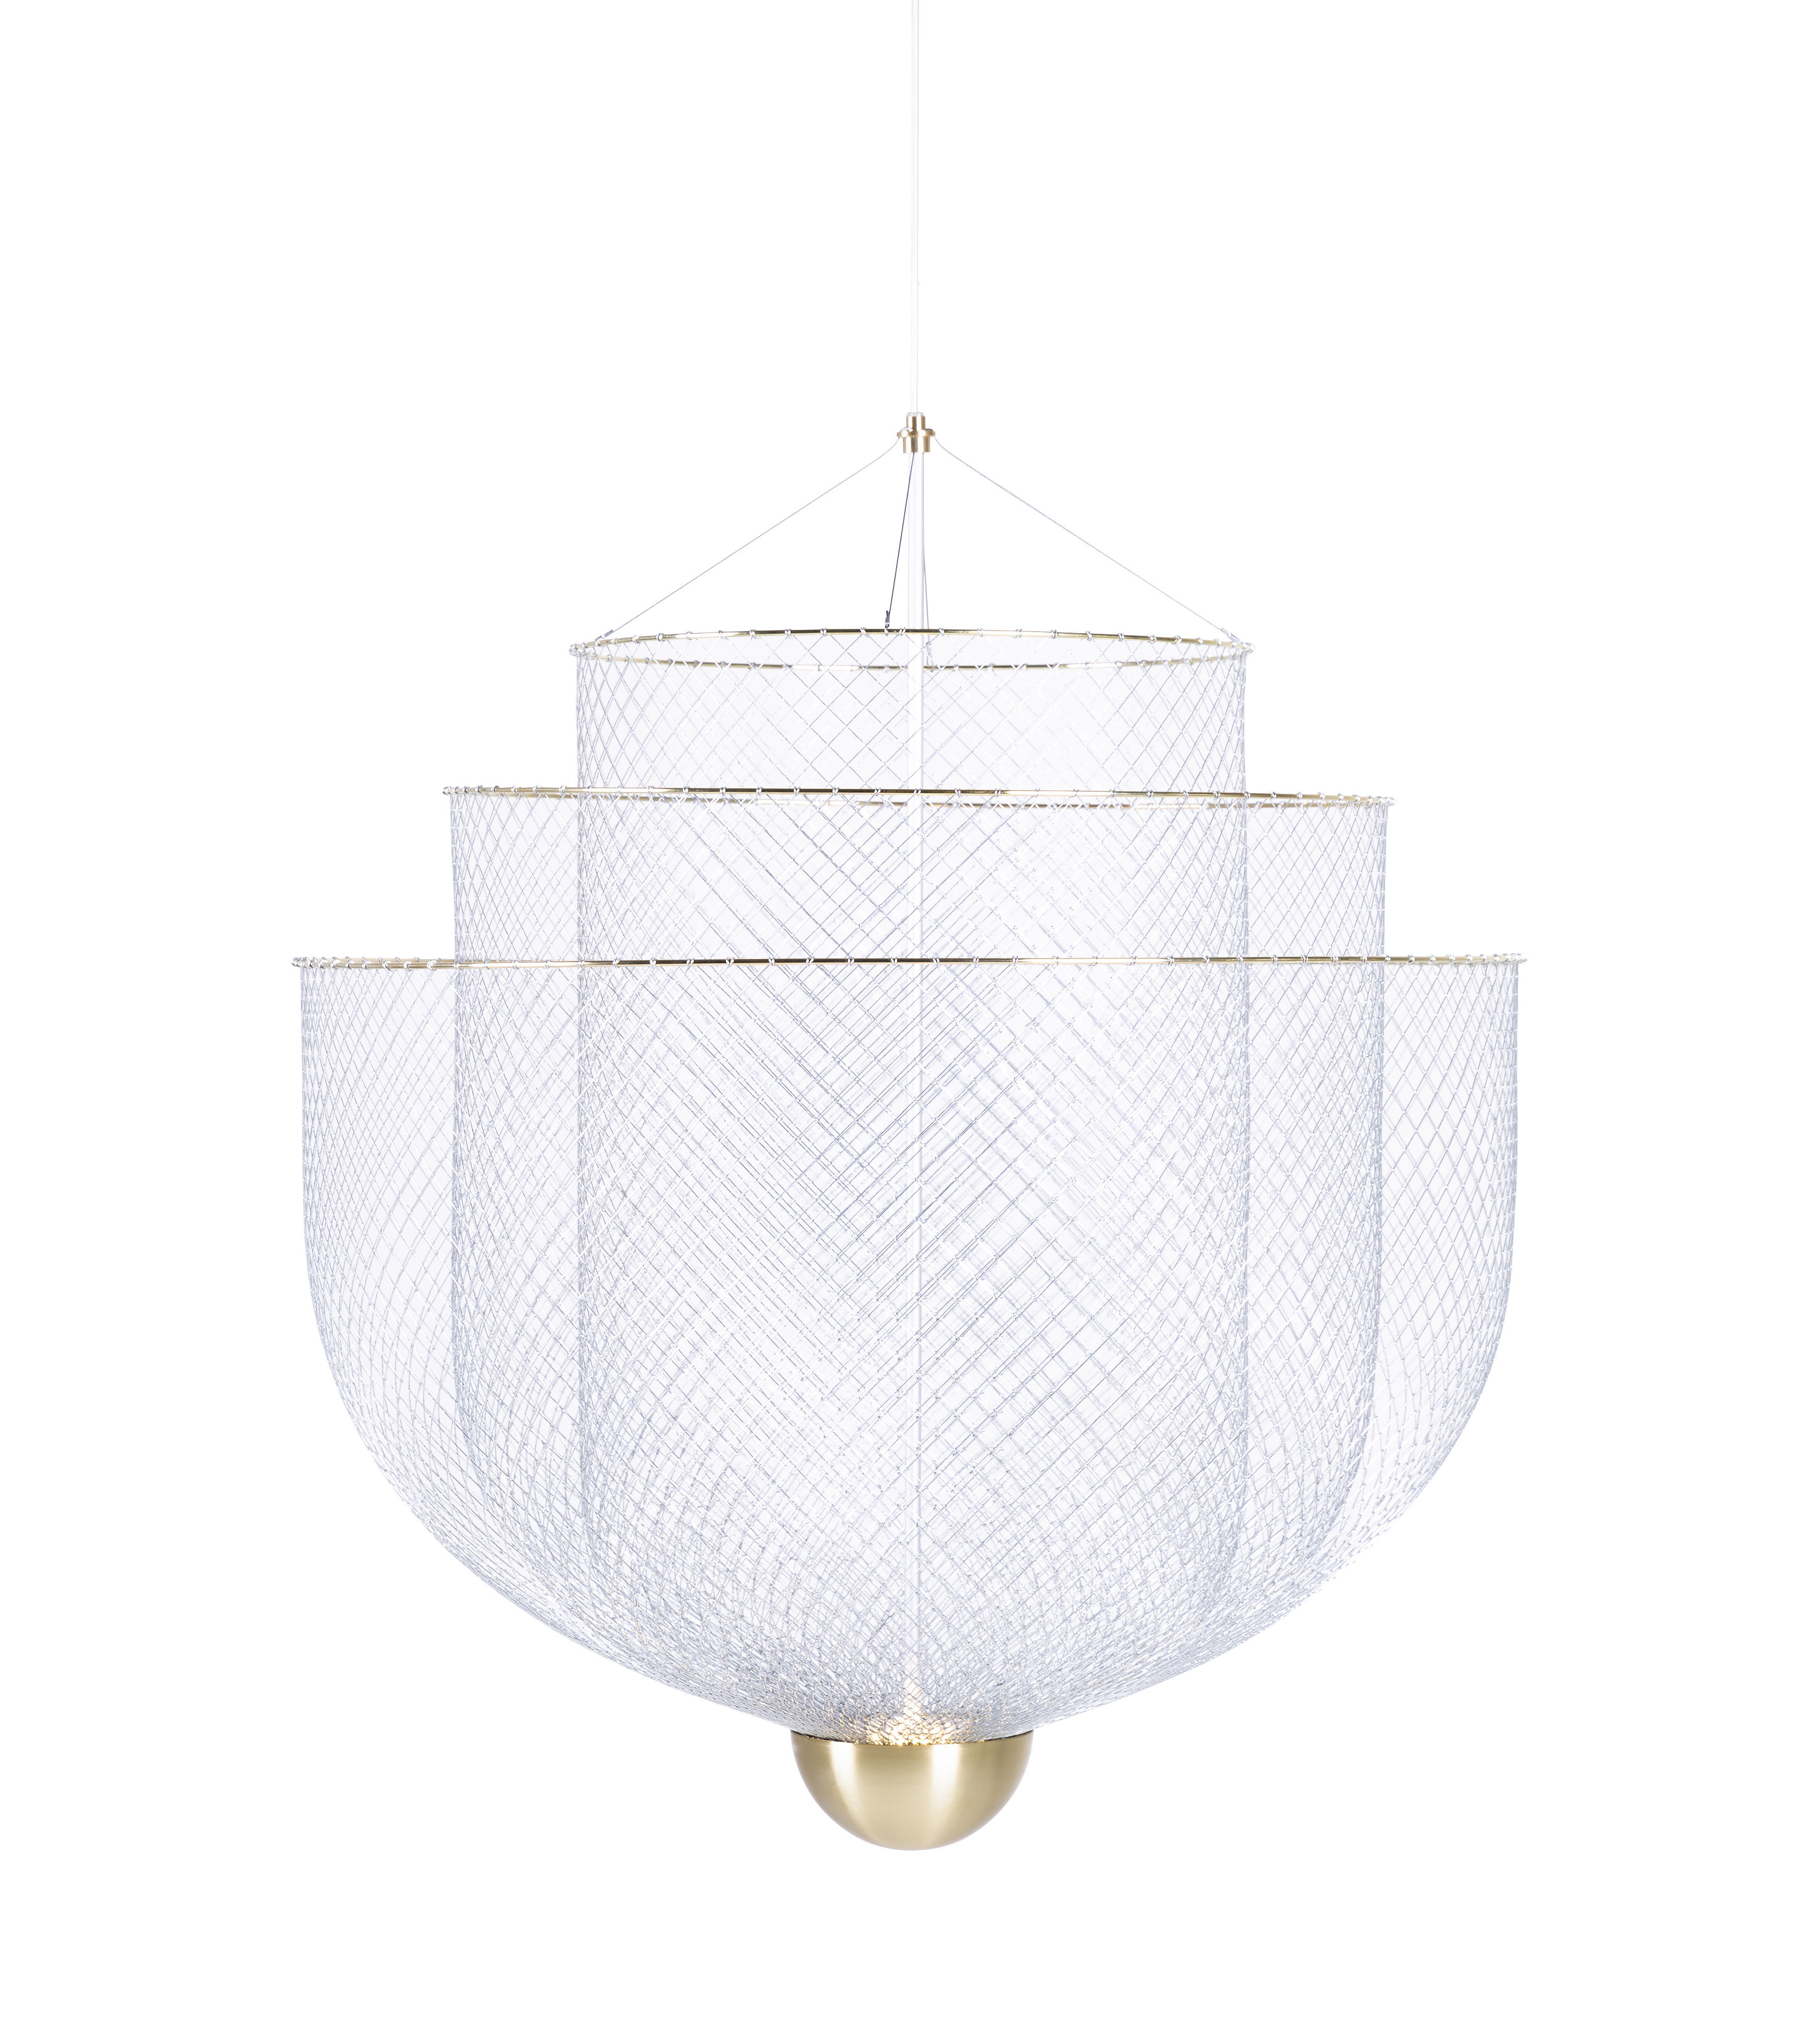 Luminaire - Suspensions - Suspension Meshmatics Small LED / Ø 58 cm - Grillagé - Moooi - Small / Acier & laiton - Grillage d'acier galvanisé, Laiton